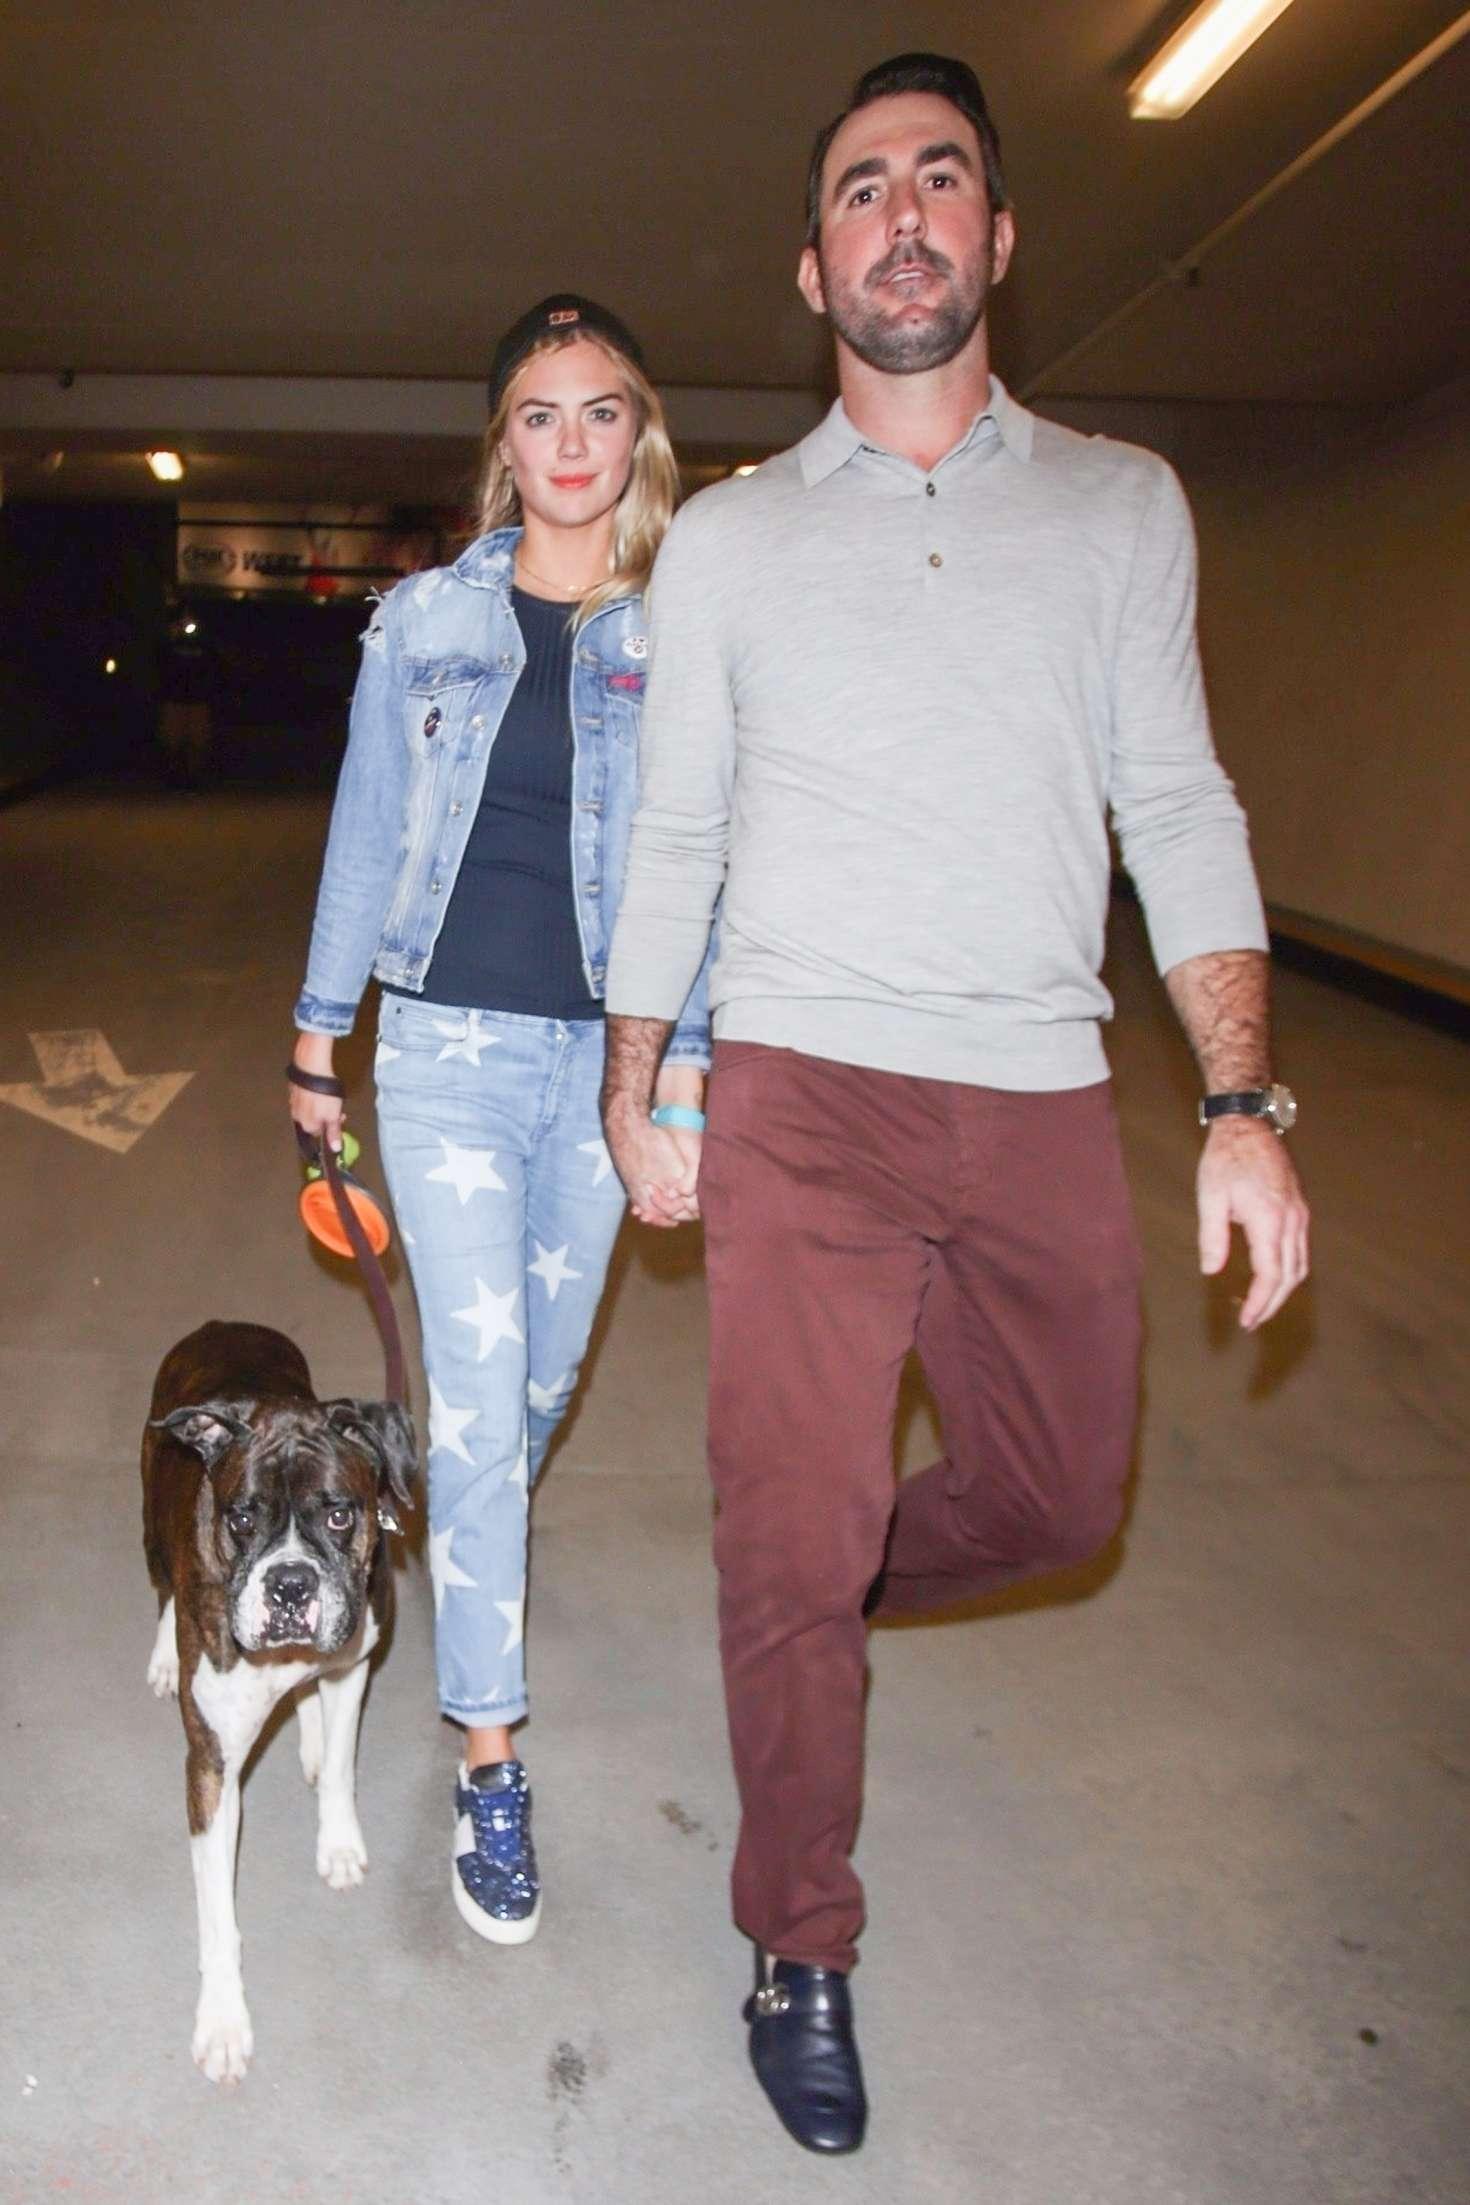 Kate Upton and Justin Verlander walk the dog in Los Angeles